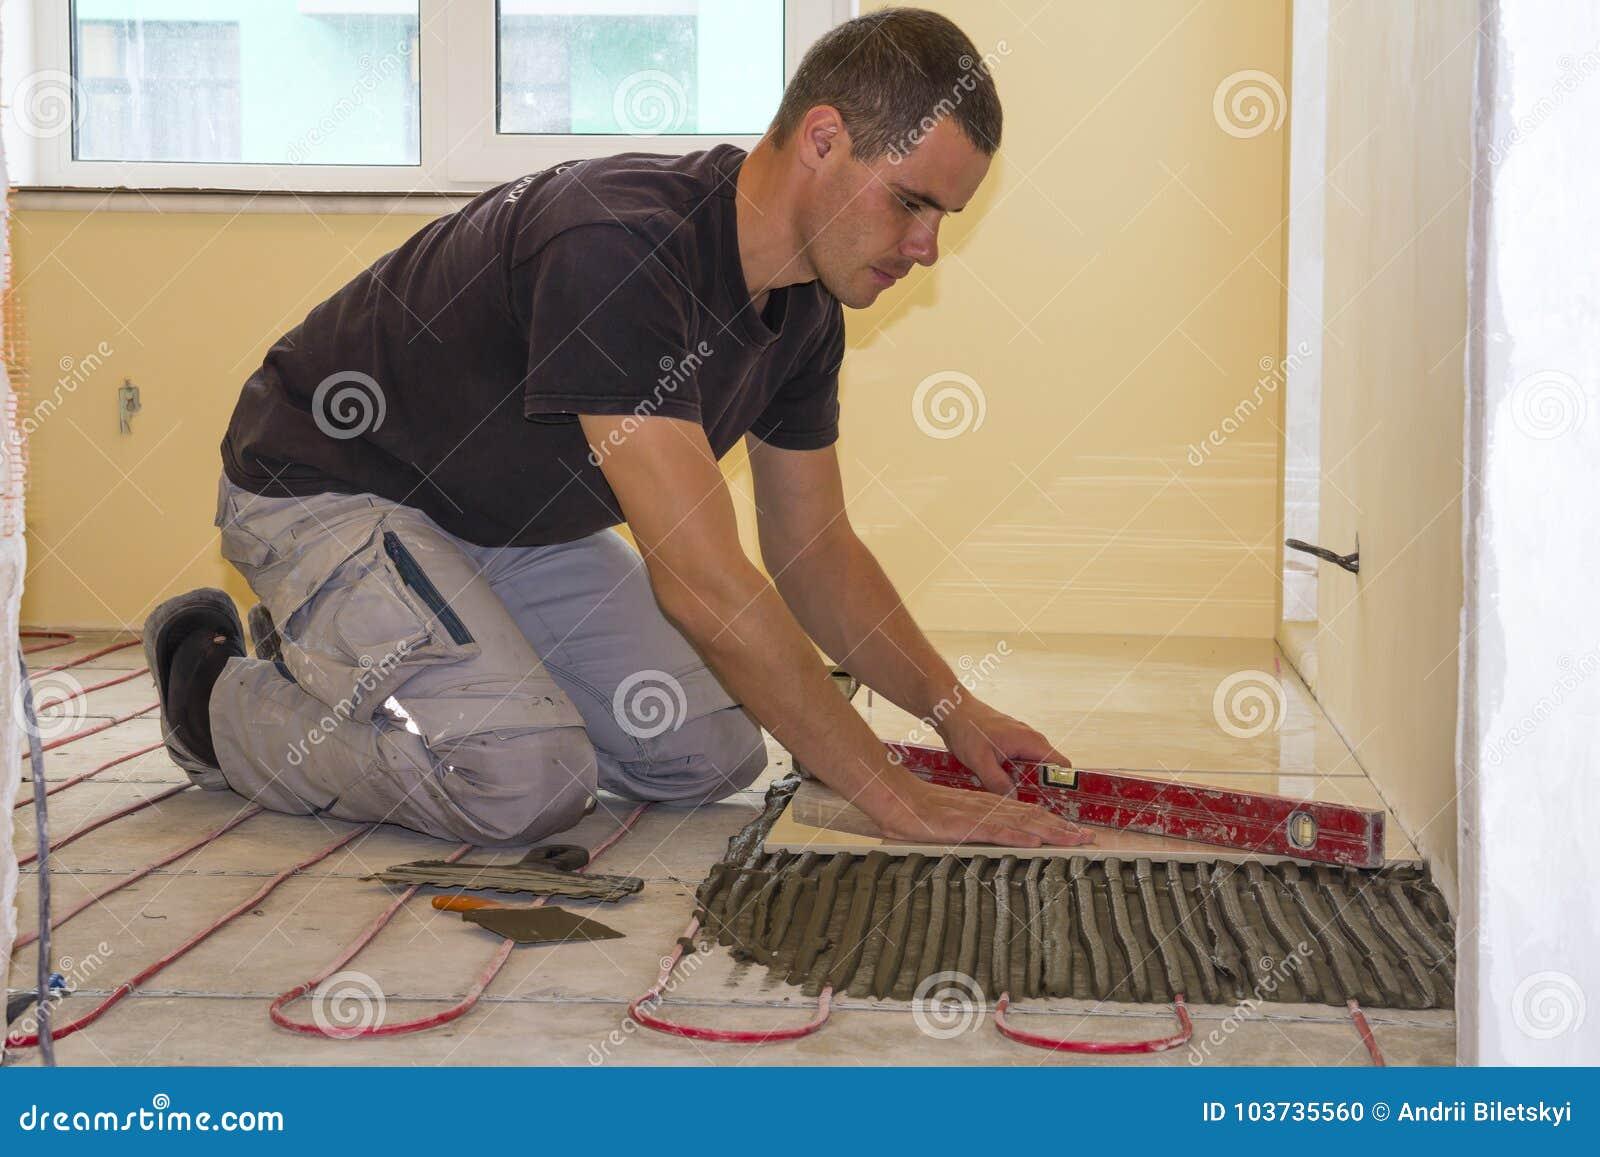 Worker installing floor tiles ceramic tiles and tools for tiler worker installing floor tiles ceramic tiles and tools for tiler royalty free stock photo download worker installing floor tiles dailygadgetfo Images